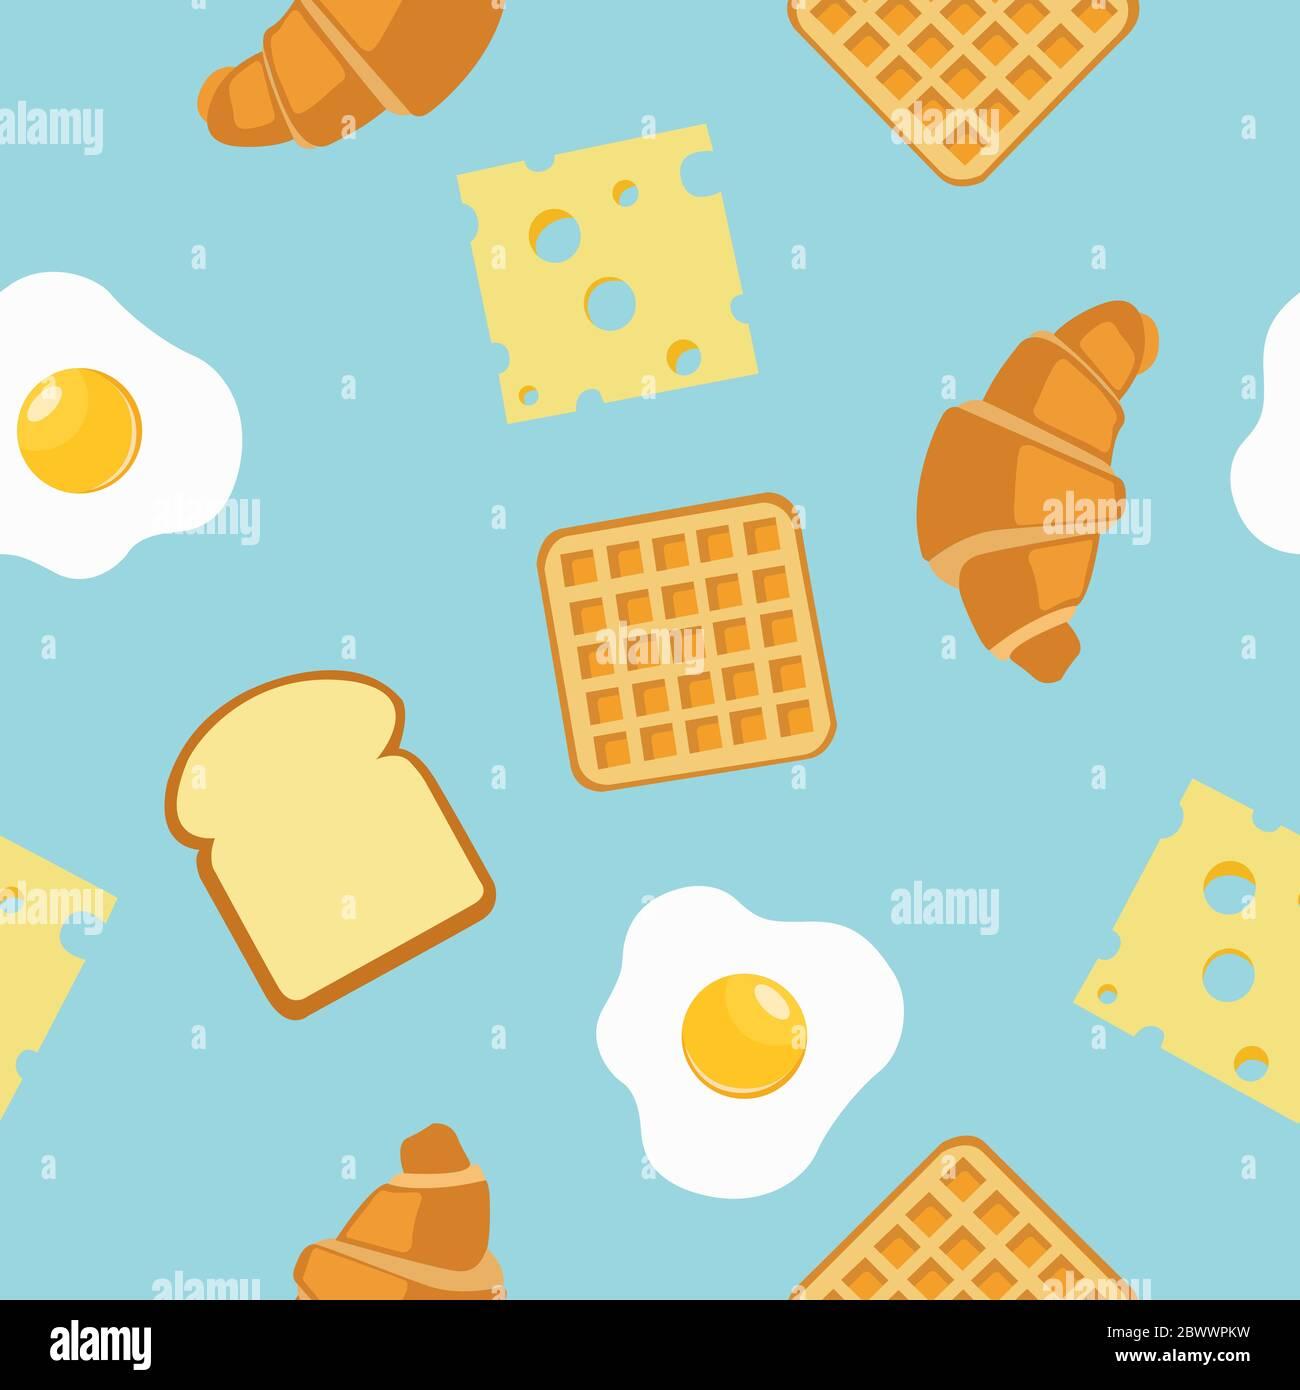 Breakfast Seamless Pattern Background Or Wallpaper Stock Vector Image Art Alamy